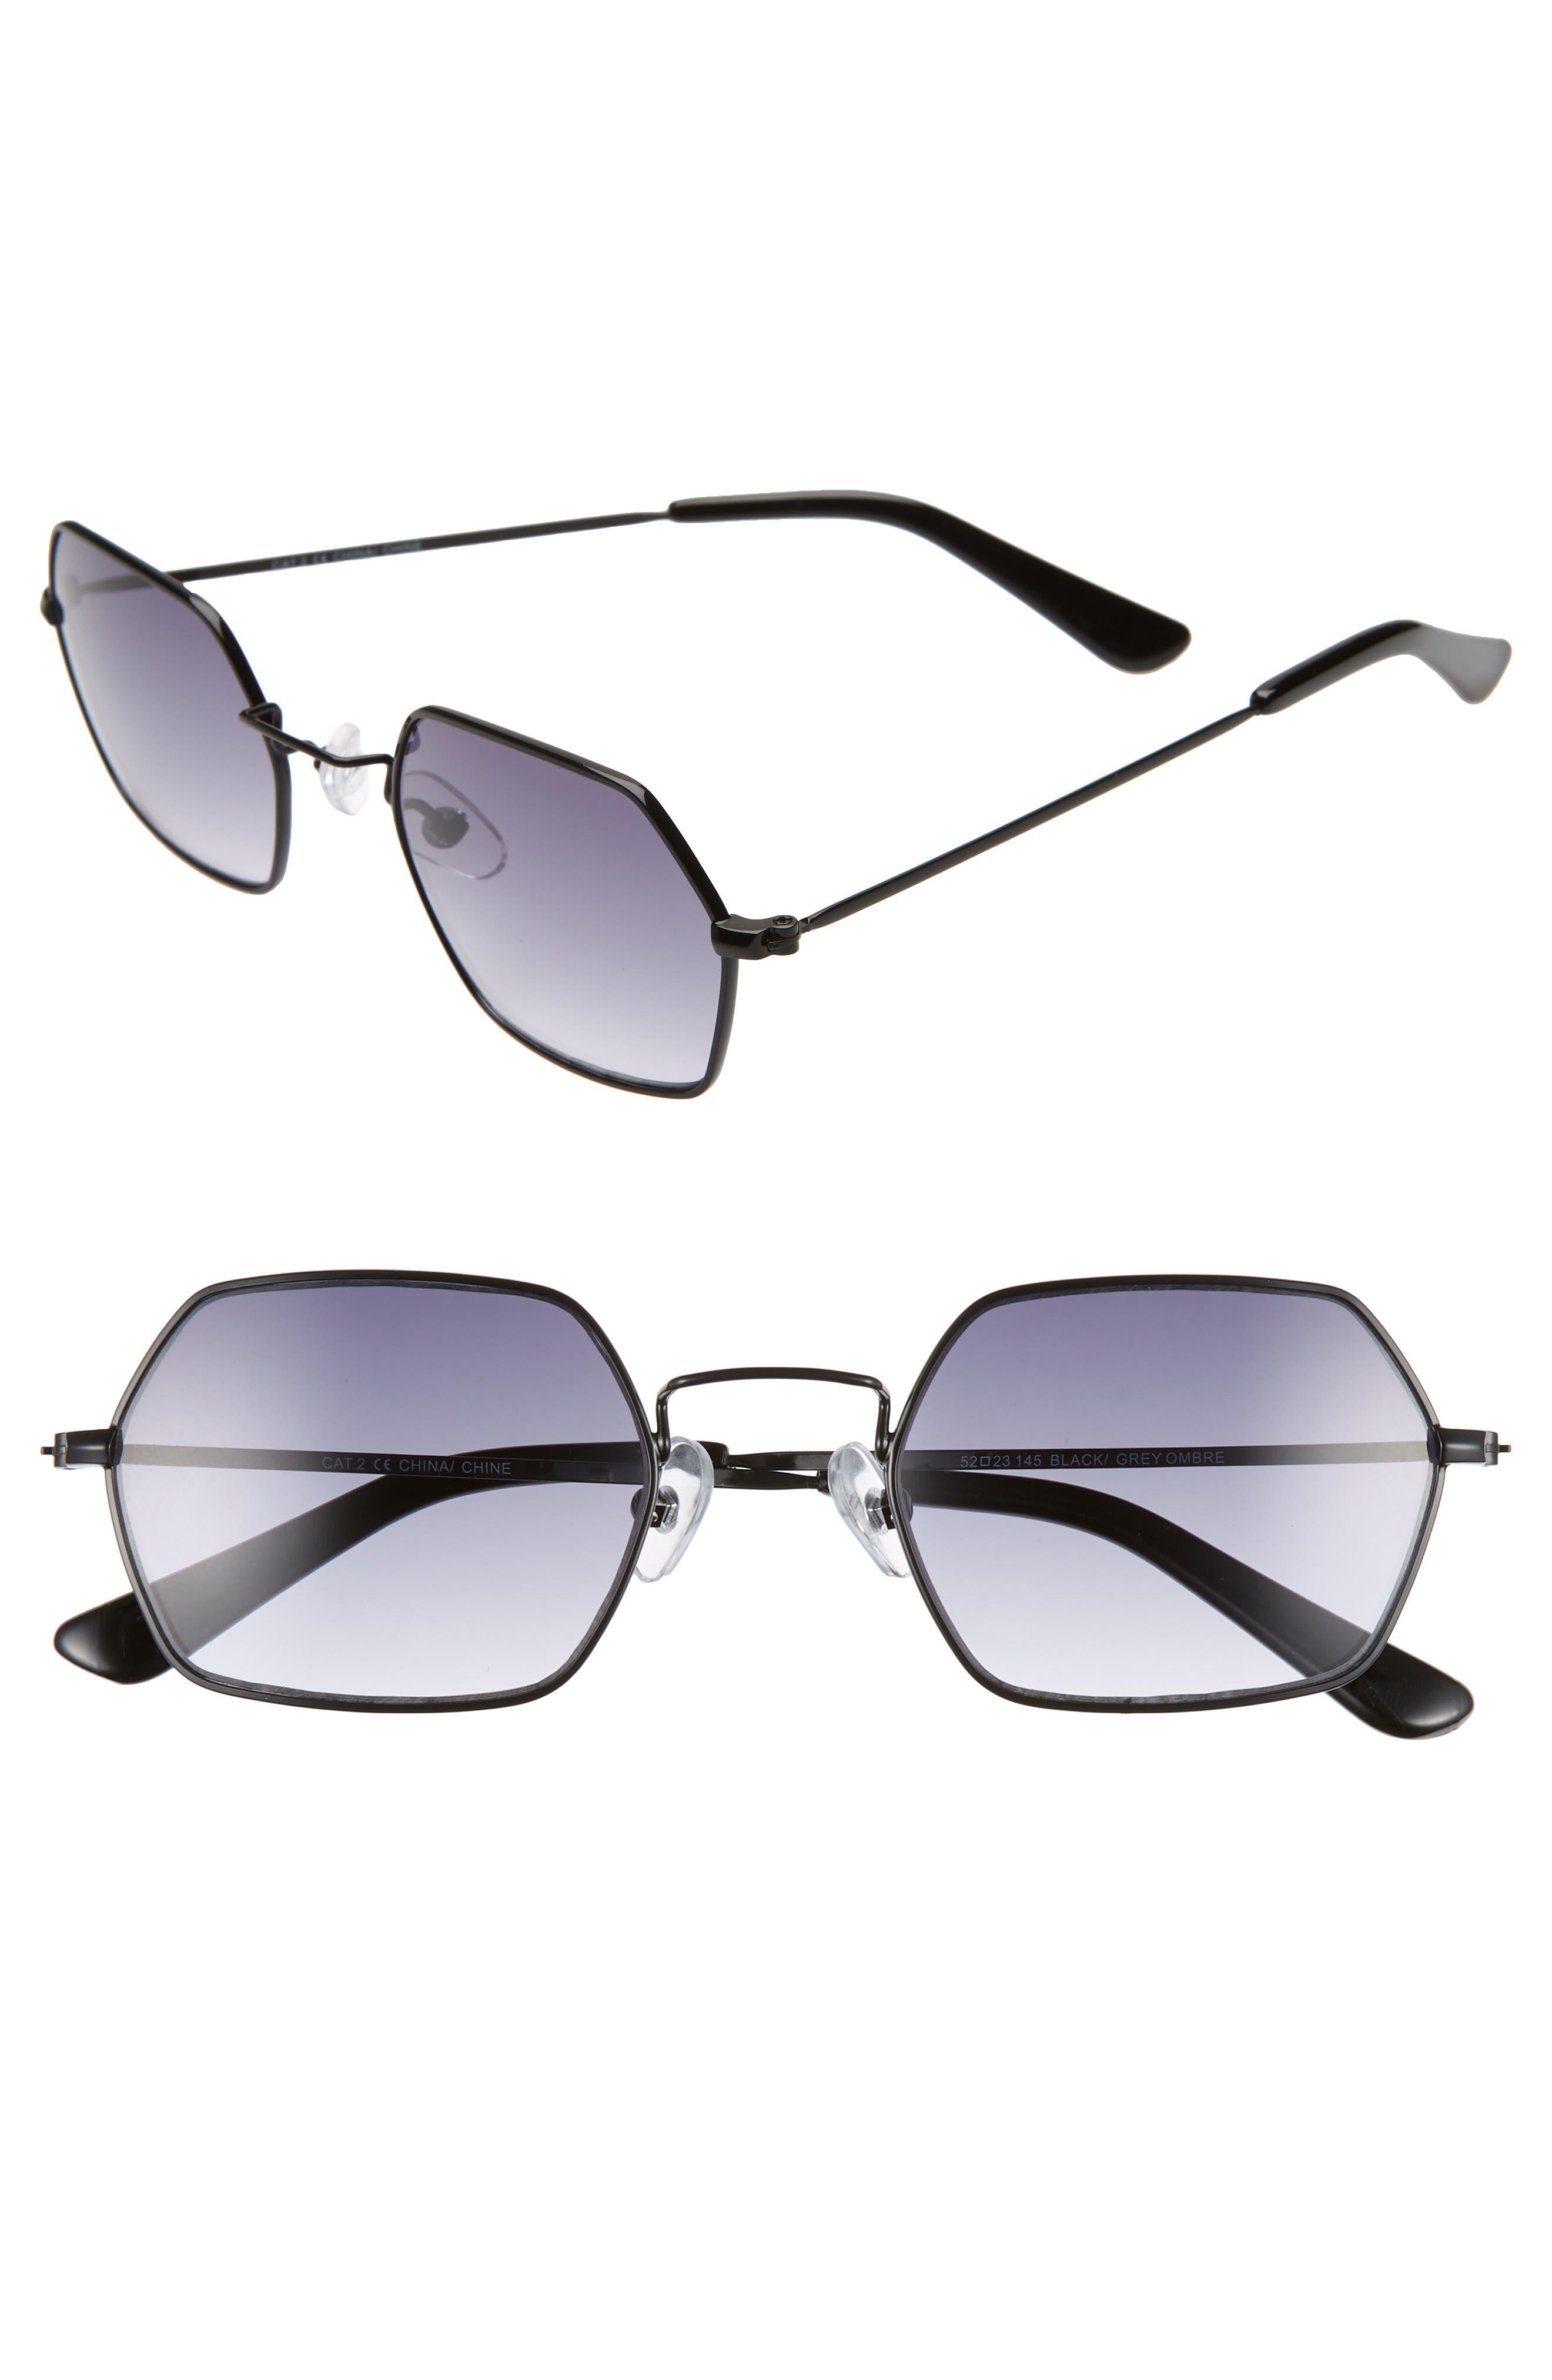 THE RAIL Russo 52mm Hexagon Sunglasses, Main, color, BLACK/ GREY OMBRE